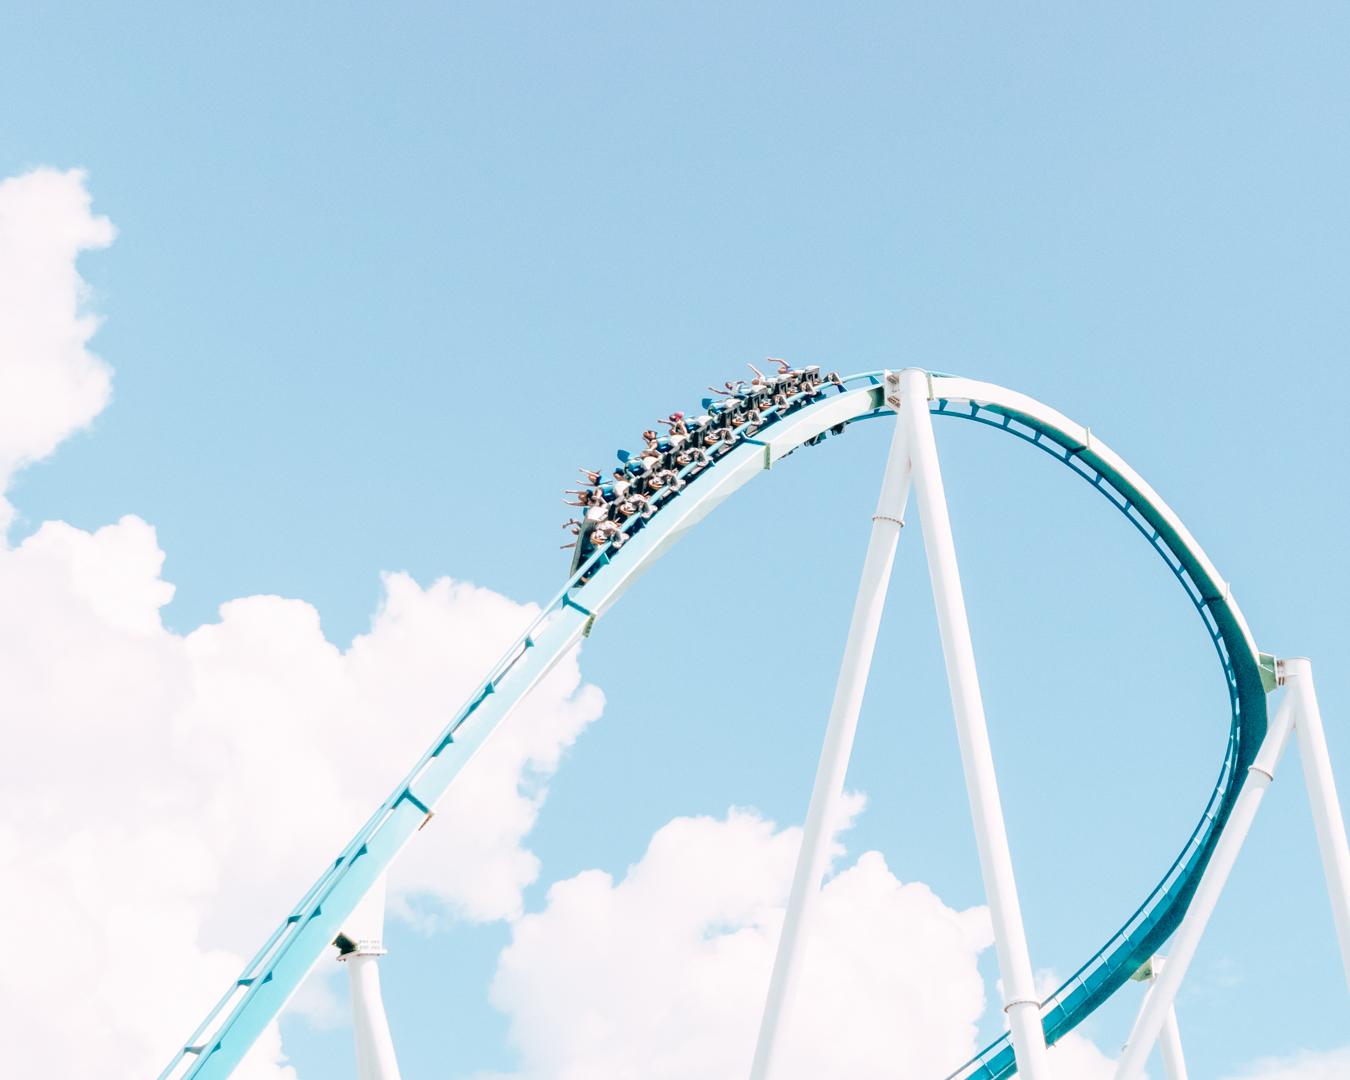 Roller coaster at Carowinds